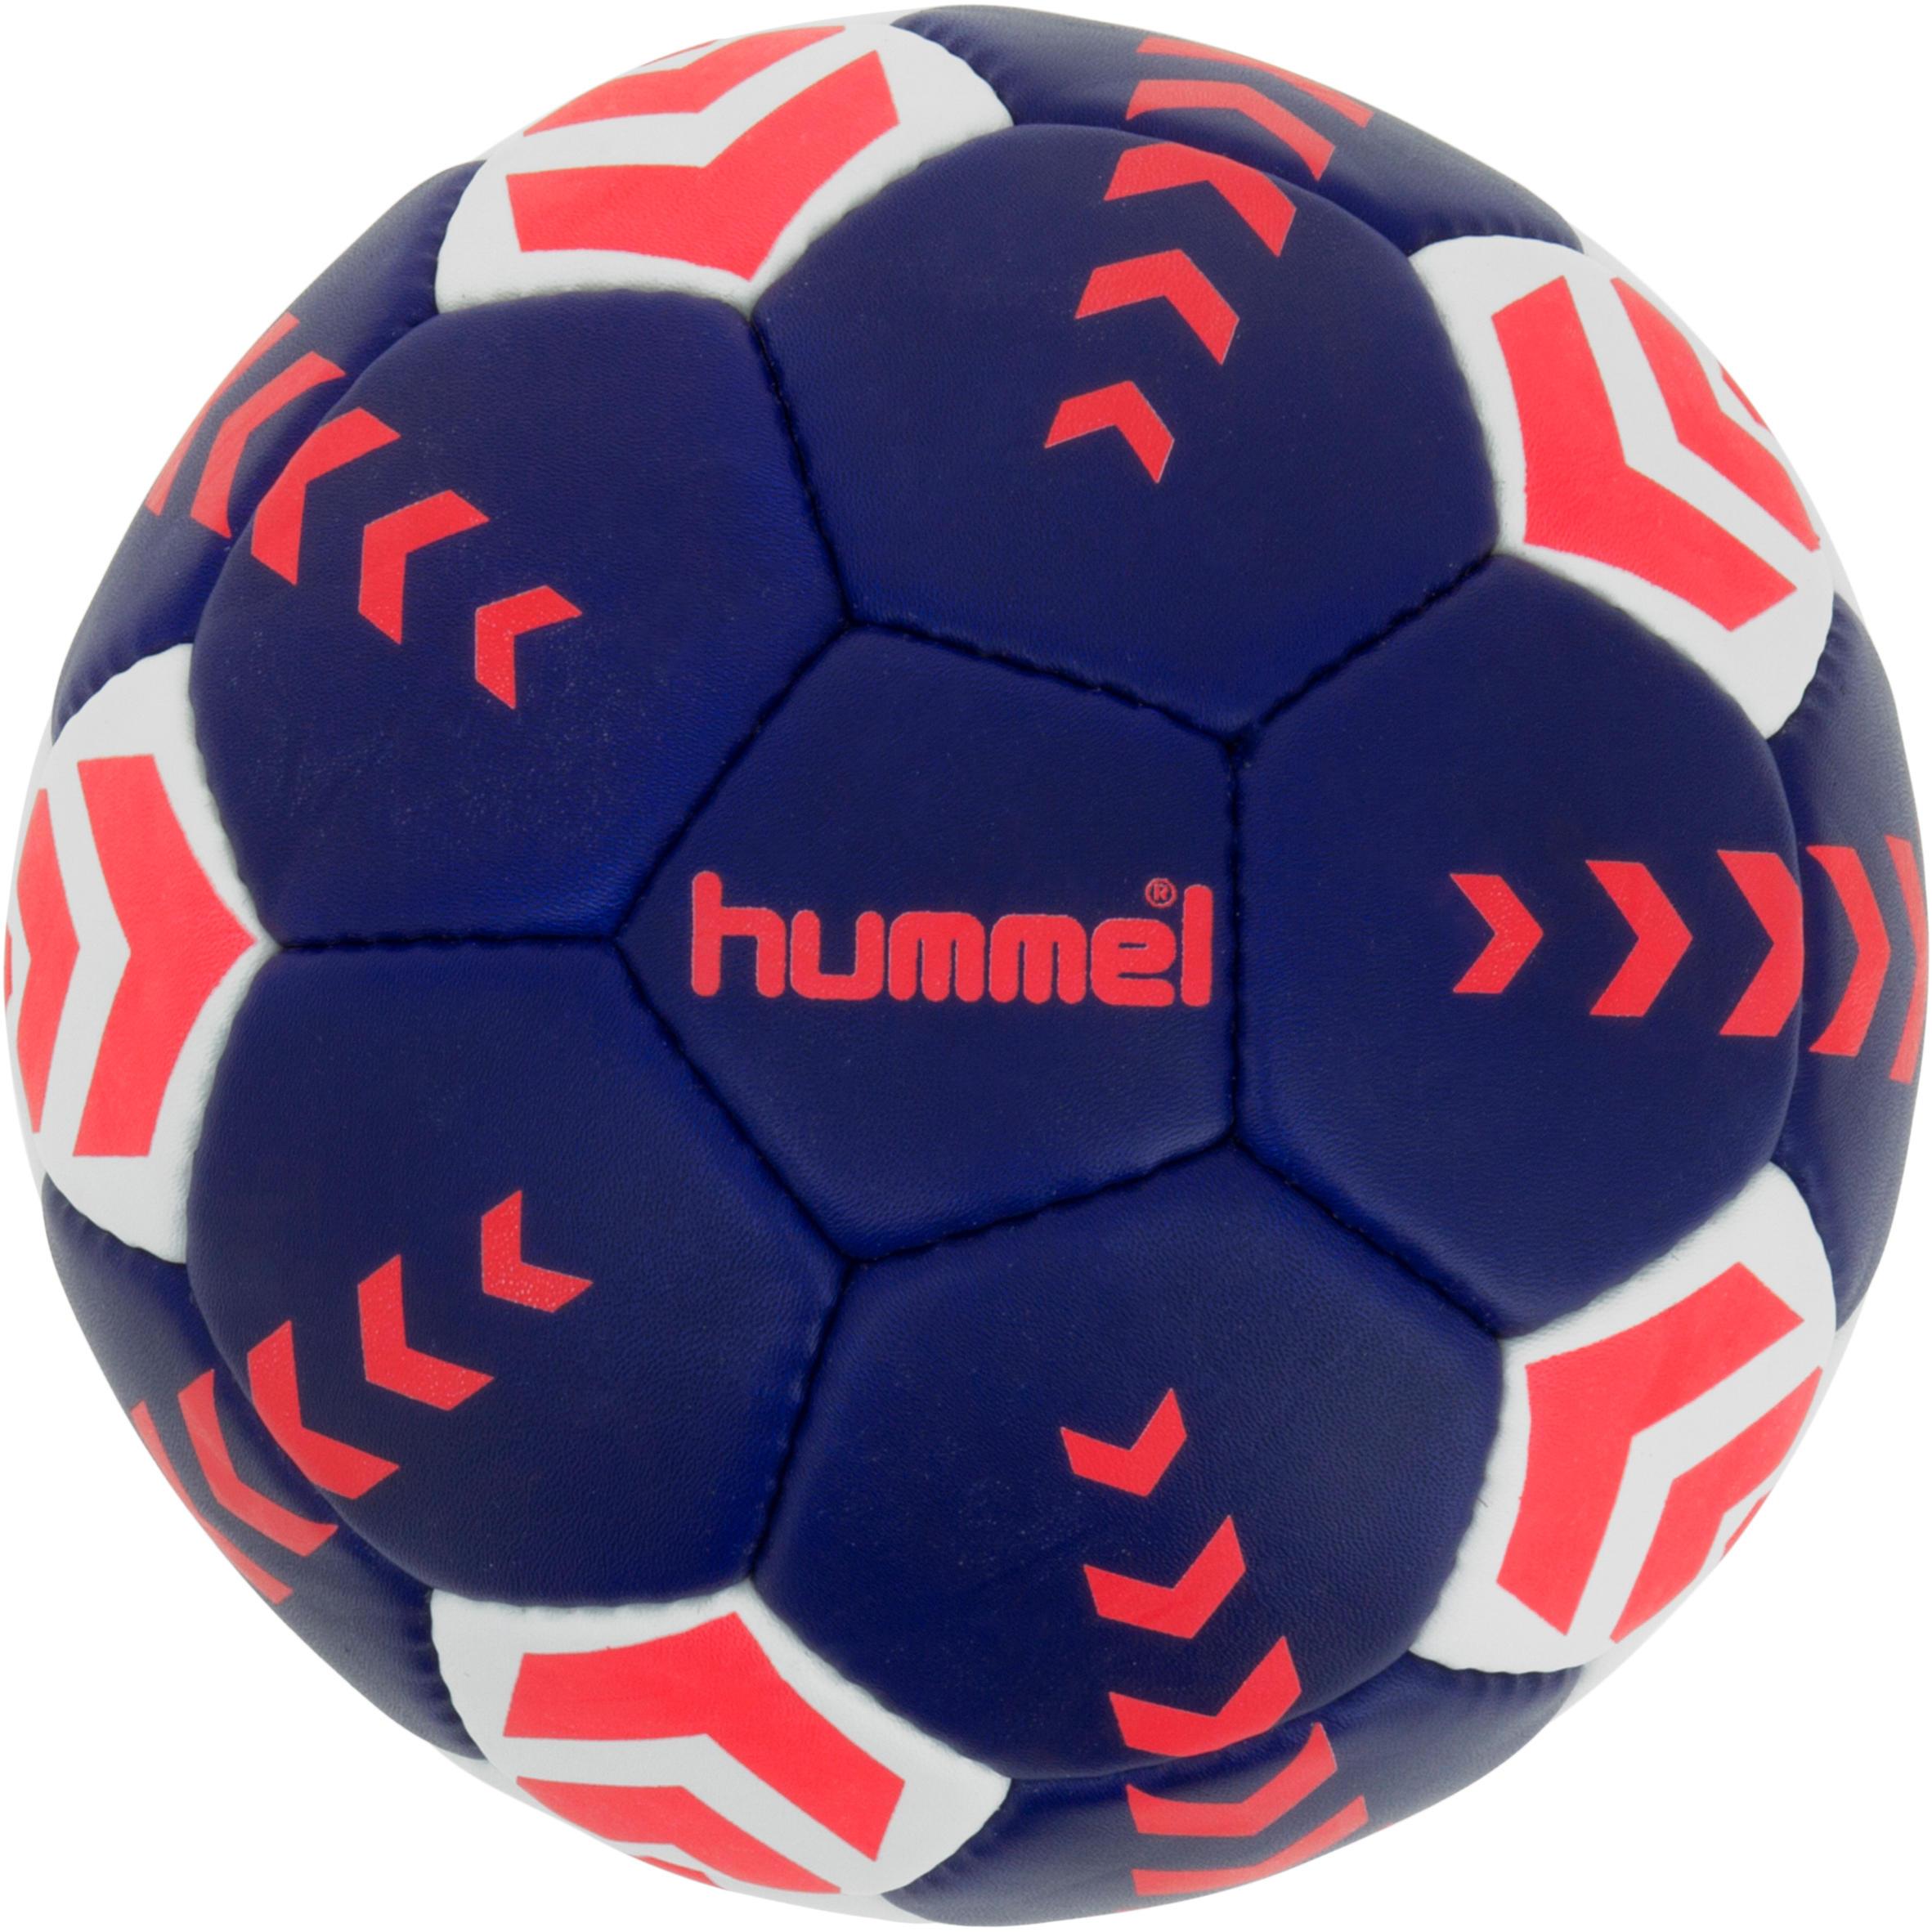 Hummel Handbal Tiger Arena blauw maat 2 17/18